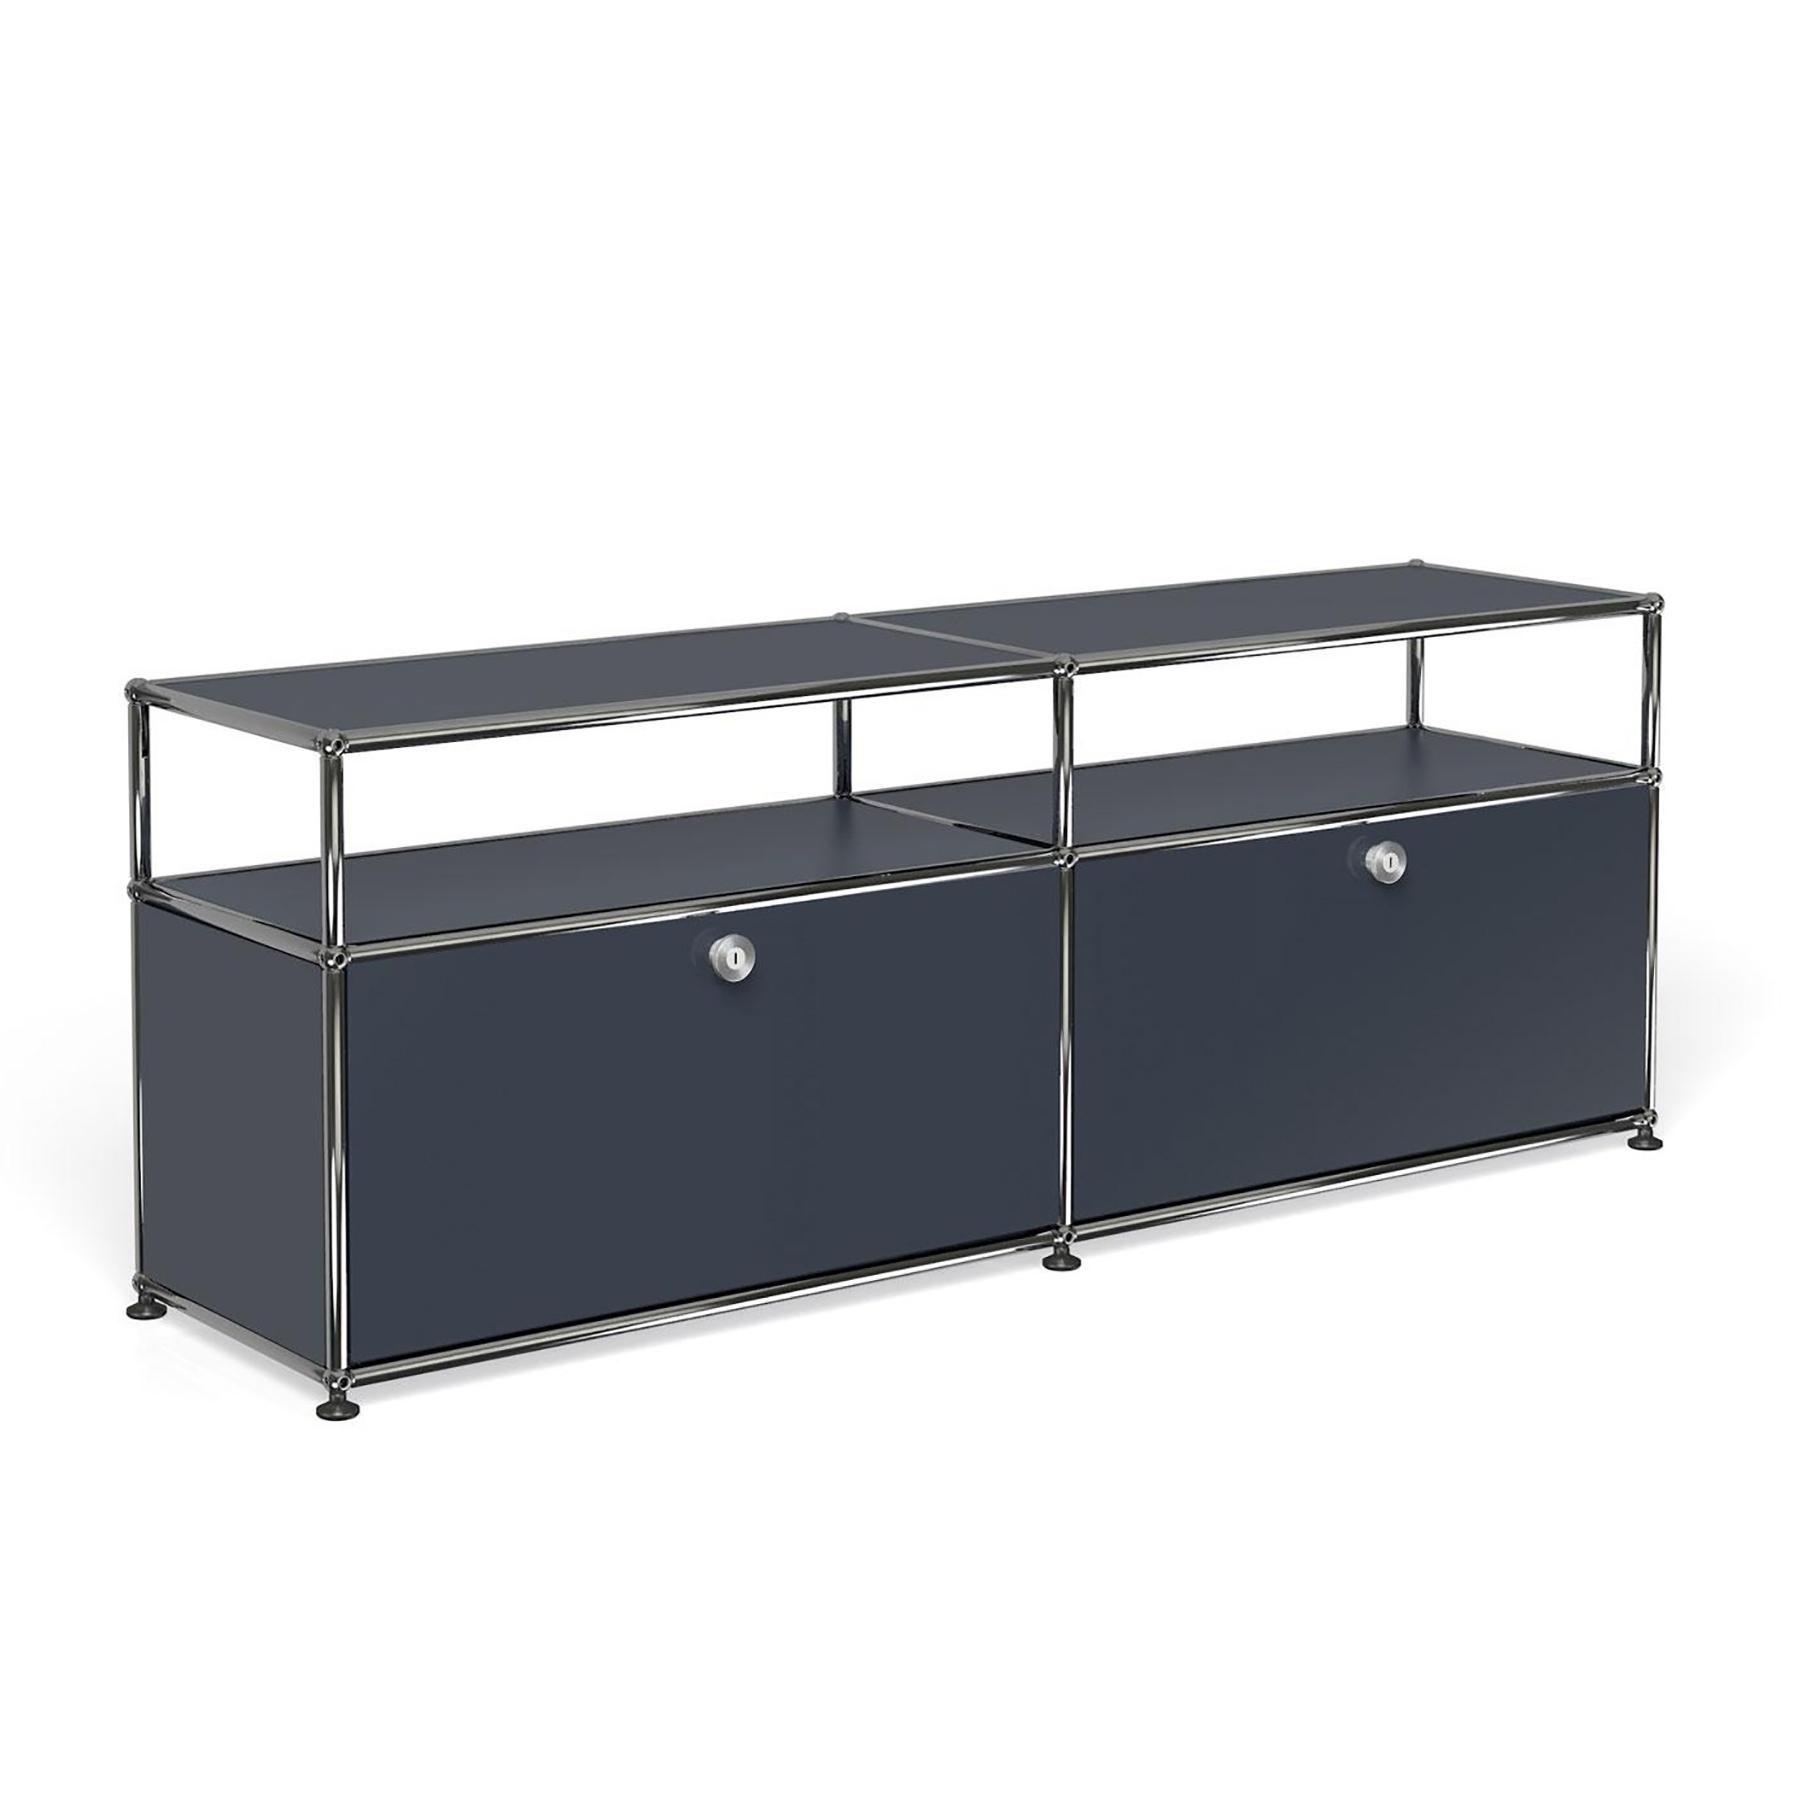 Rustikal Mangoholz Lowboards Online Kaufen Möbel Suchmaschine